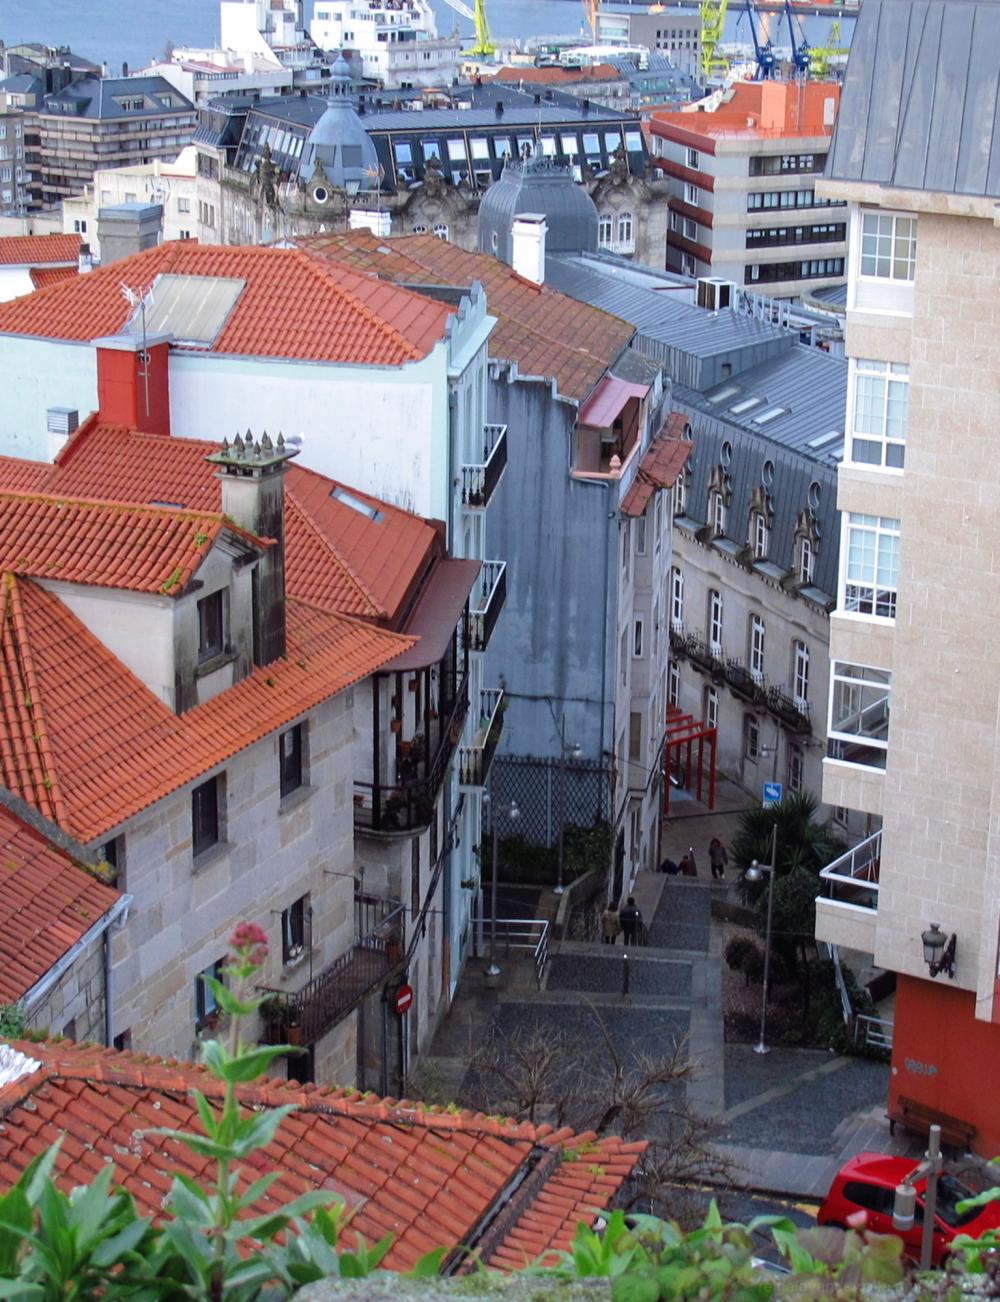 City stairways